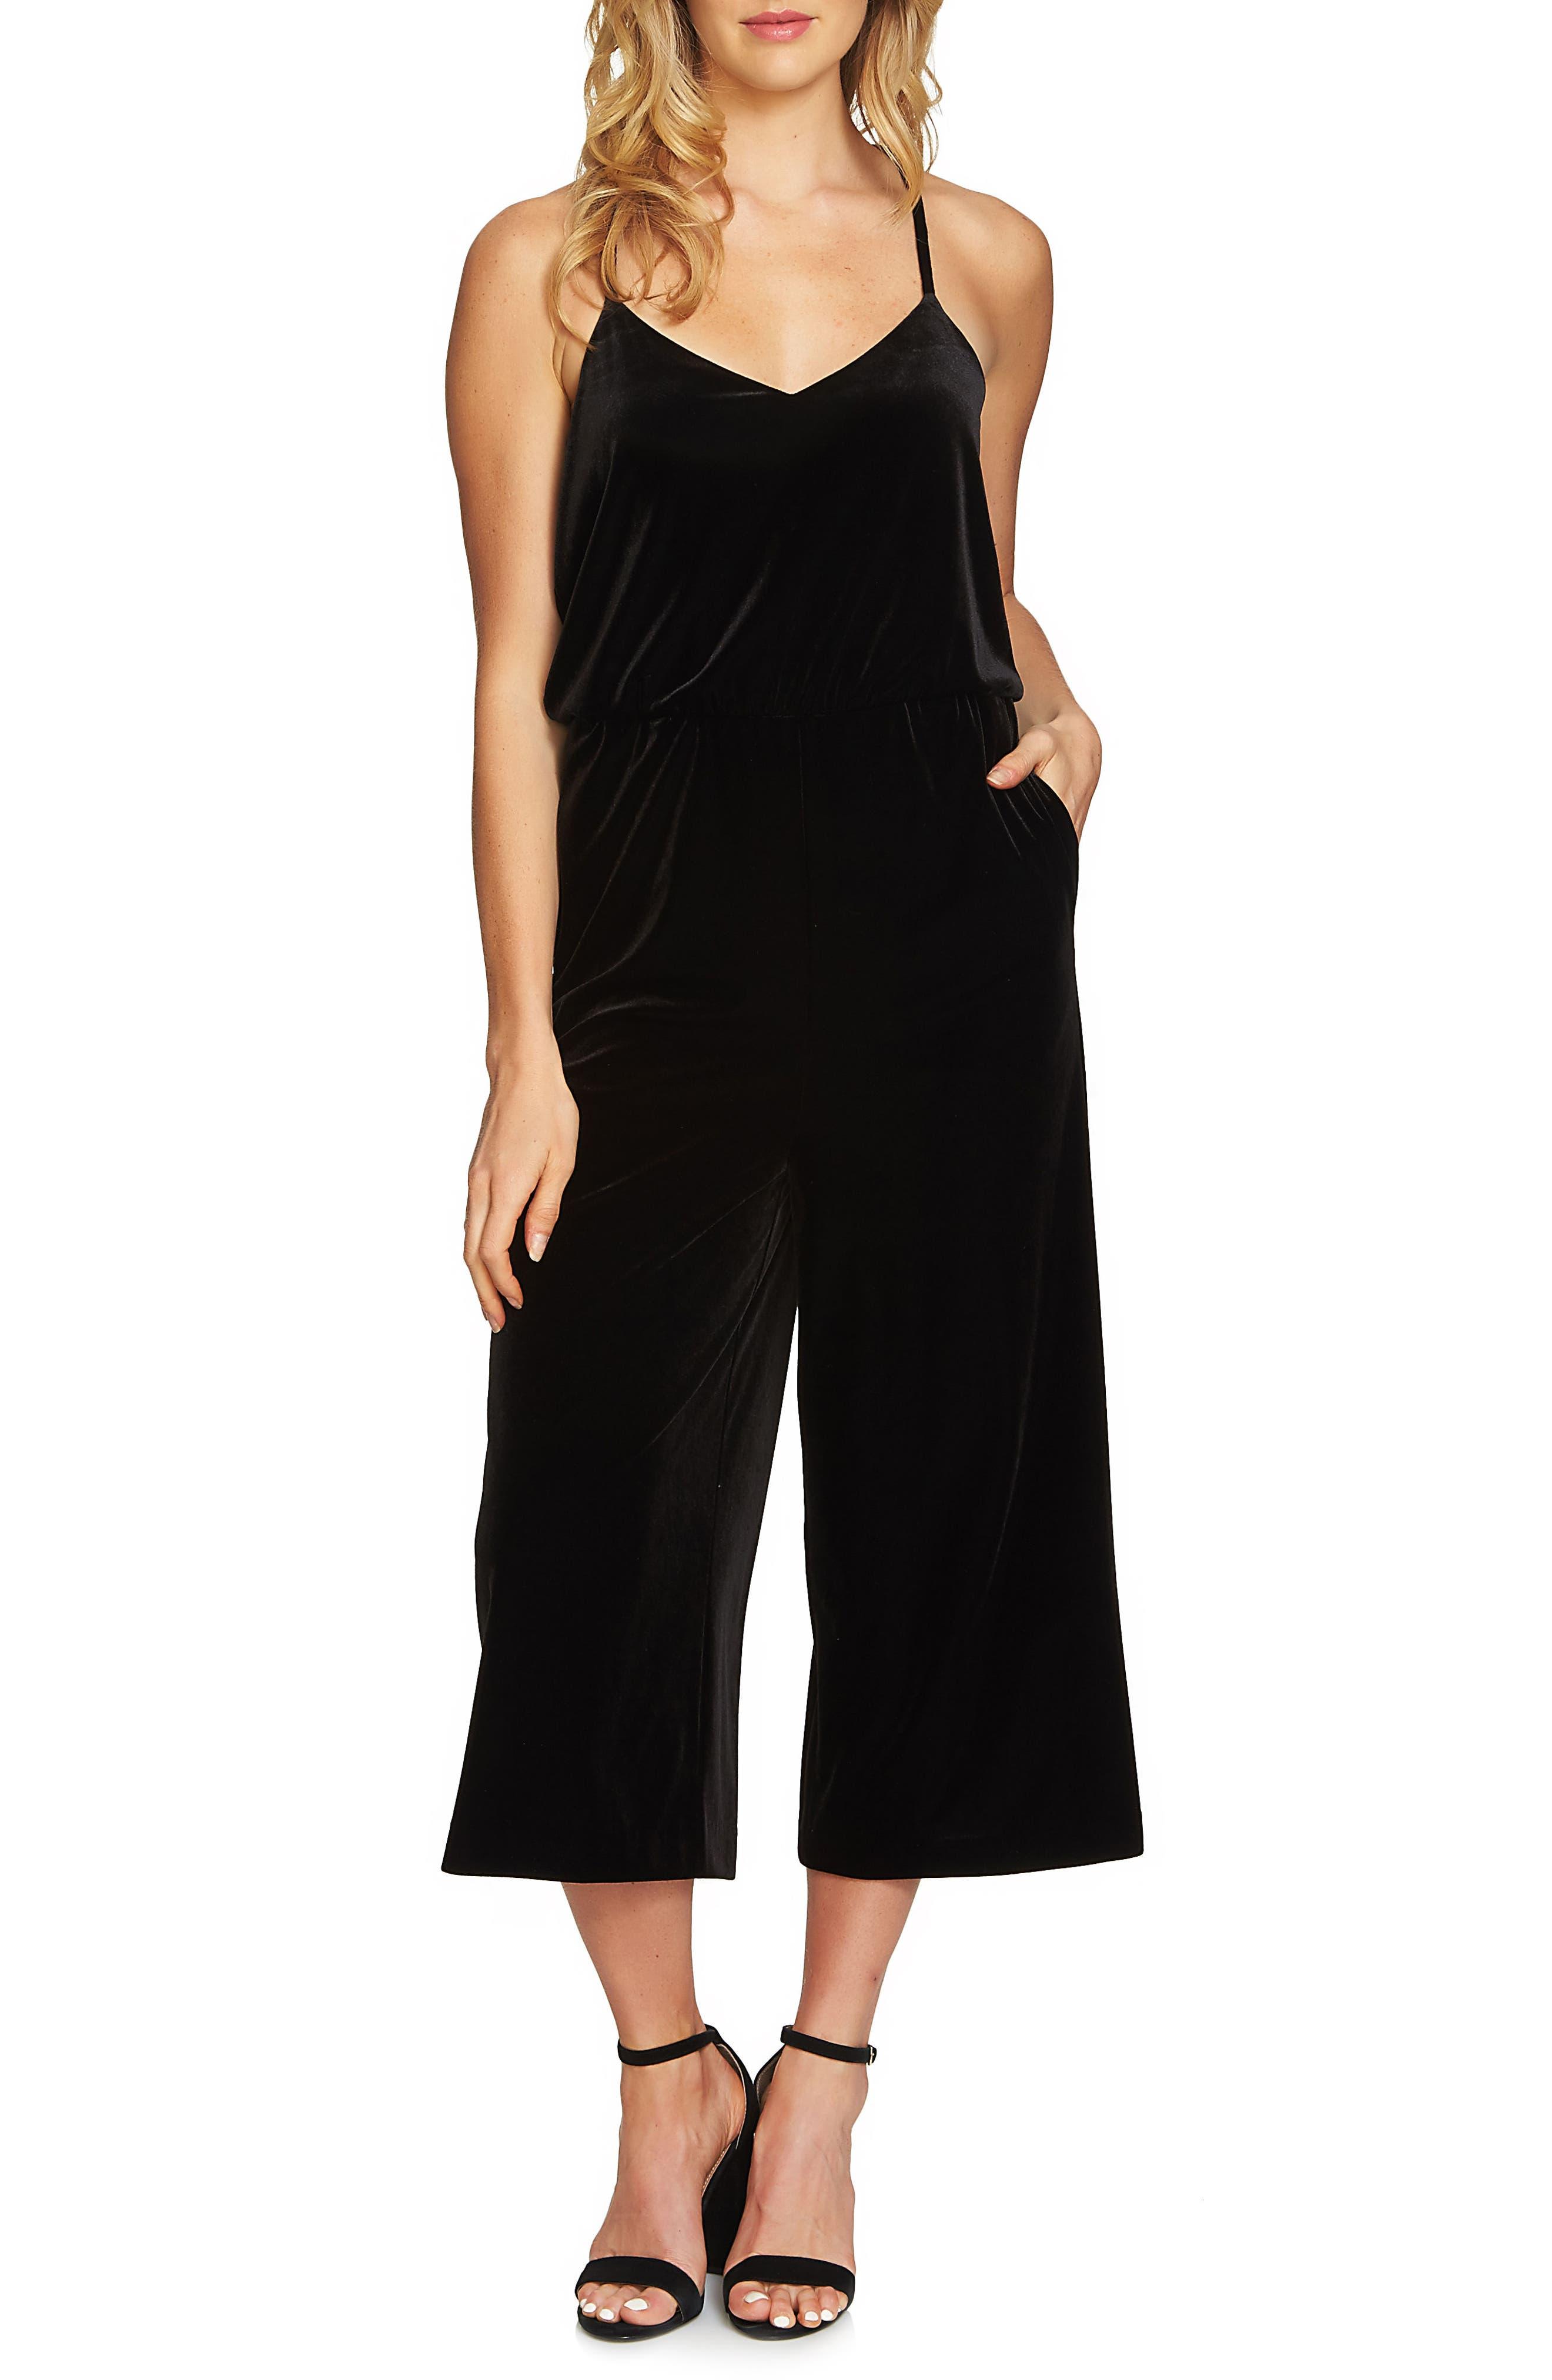 Alternate Image 1 Selected - 1.STATE Velvet Culotte Jumpsuit